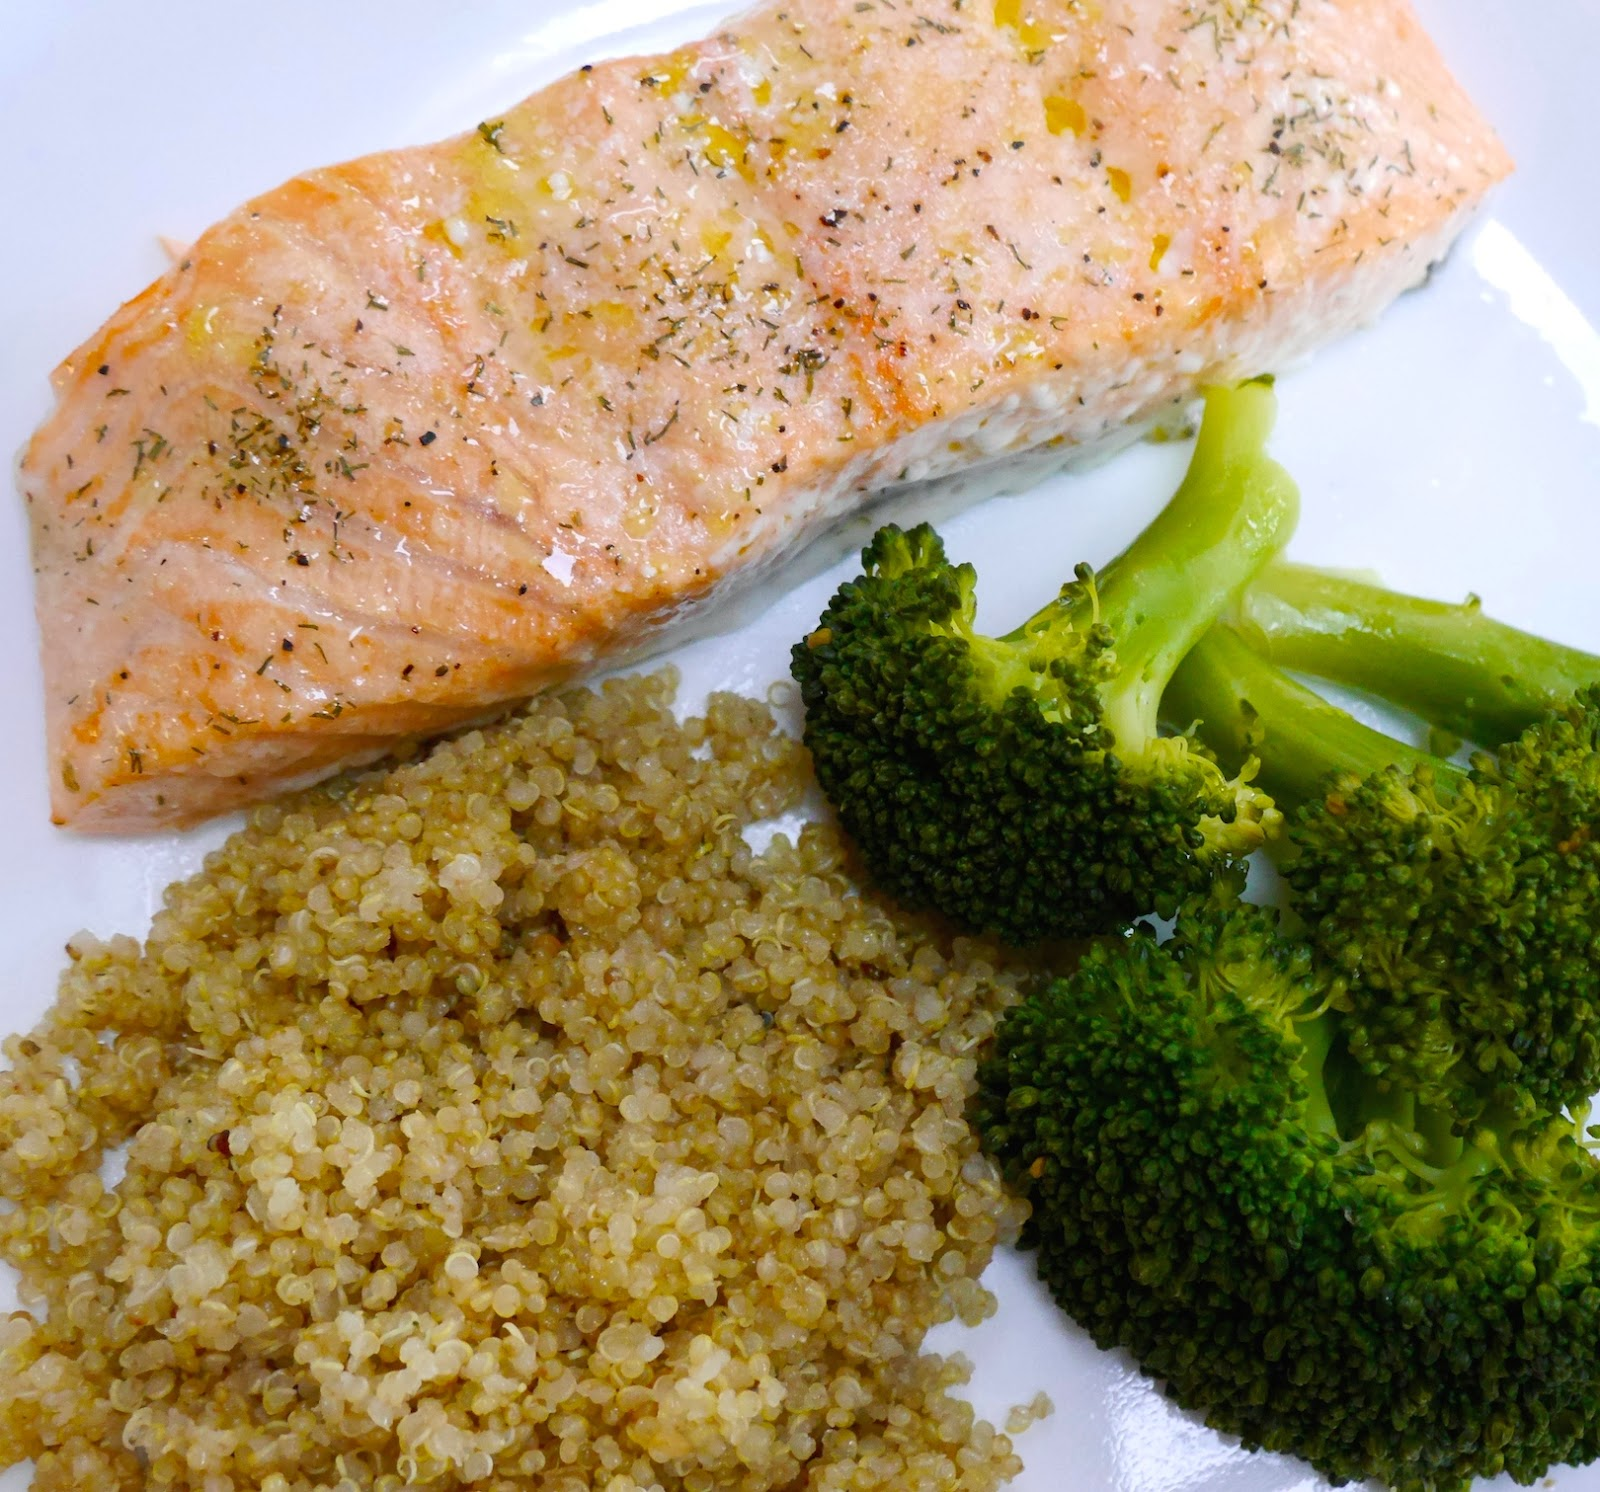 is fish agianst a vegatarian diet